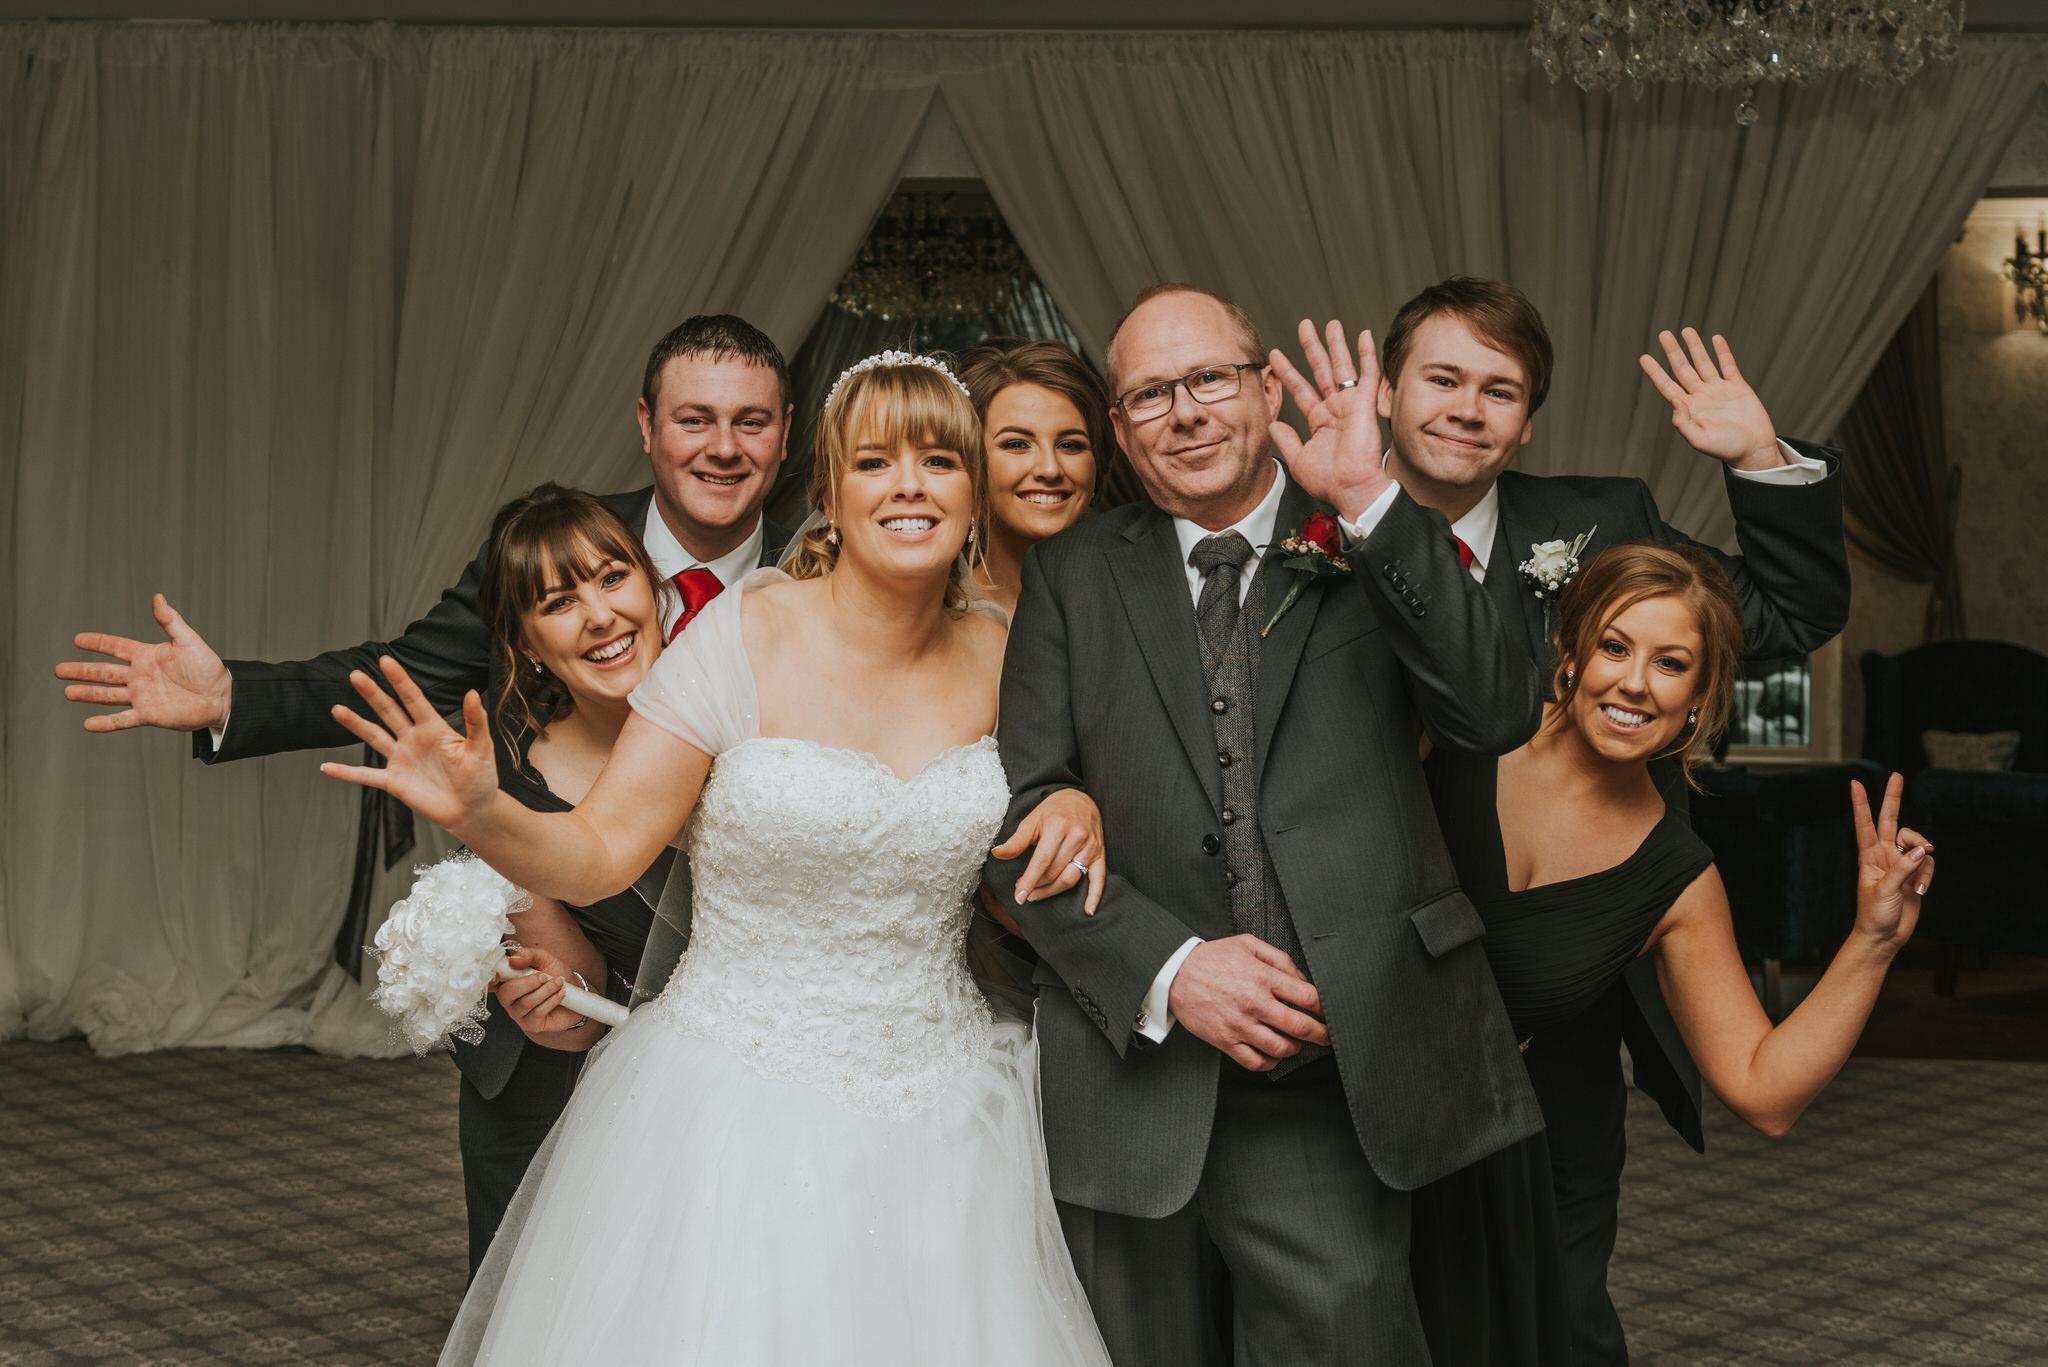 Leighinmohr_House_Hotel_Wedding_Karen_and_Garnet_62